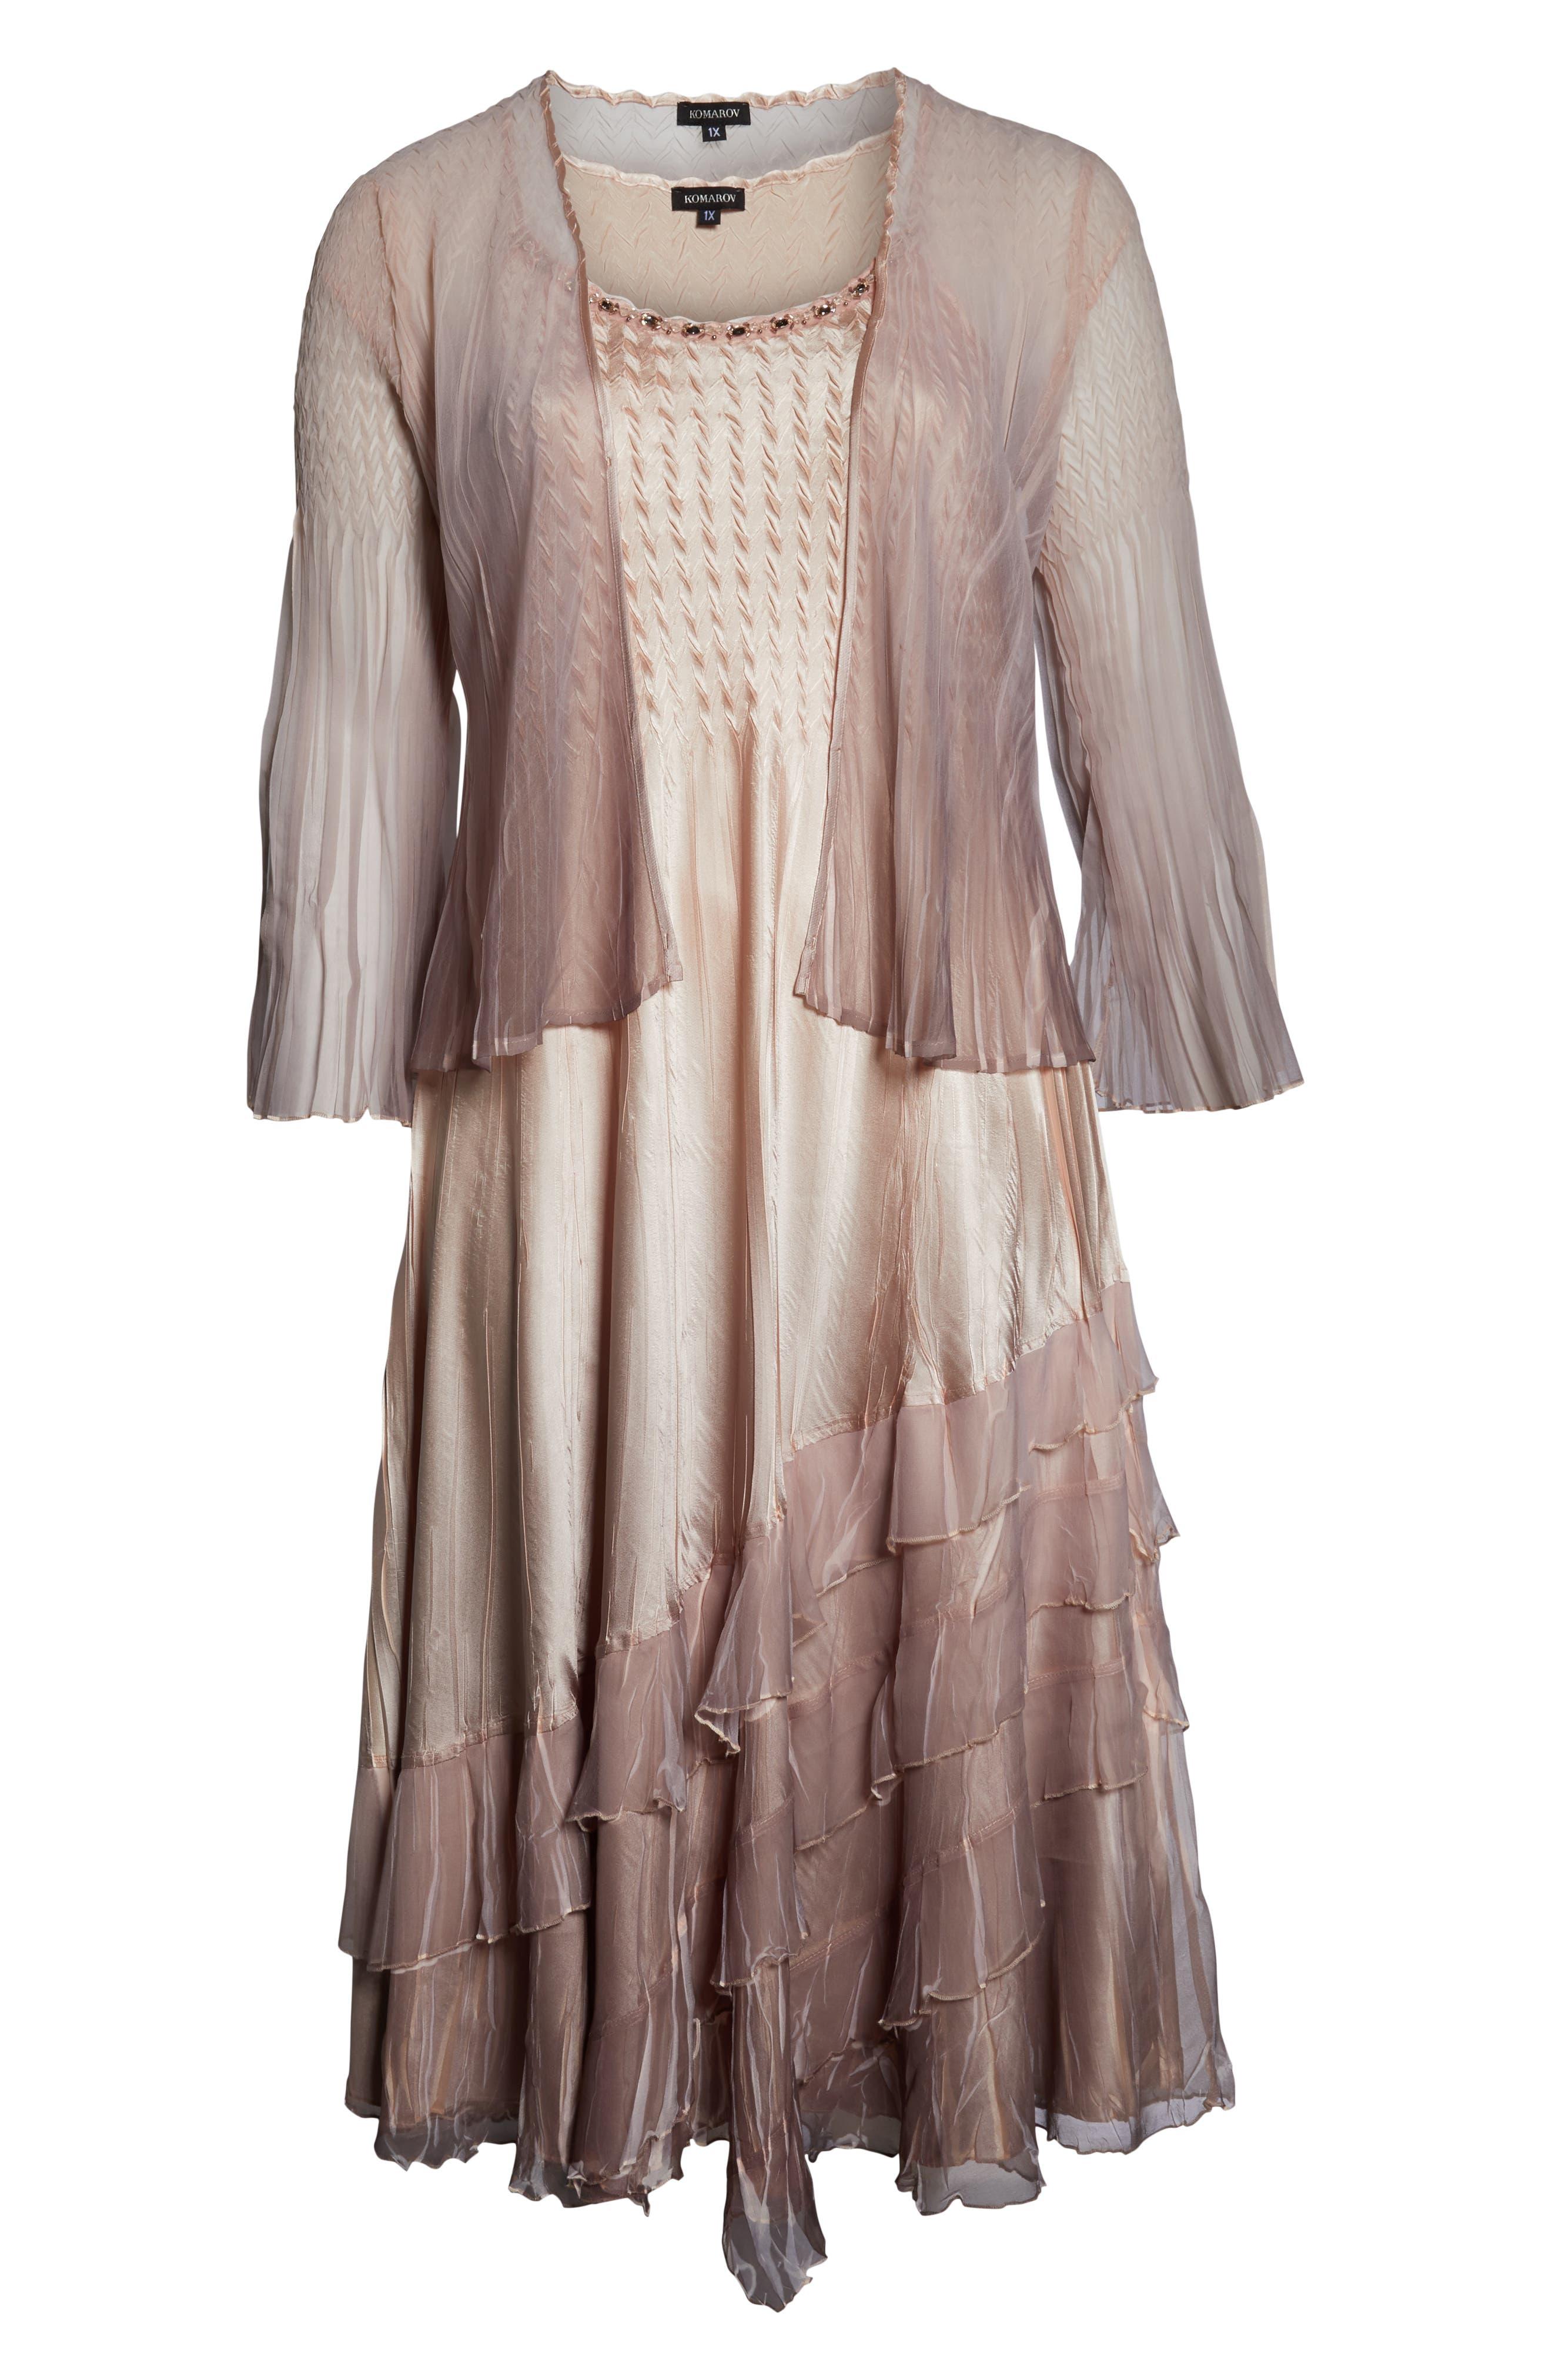 KOMAROV, Tiered Hem Ombré Dress with Jacket, Alternate thumbnail 7, color, VINTAGE ROSE WITH CAFE OMBRE